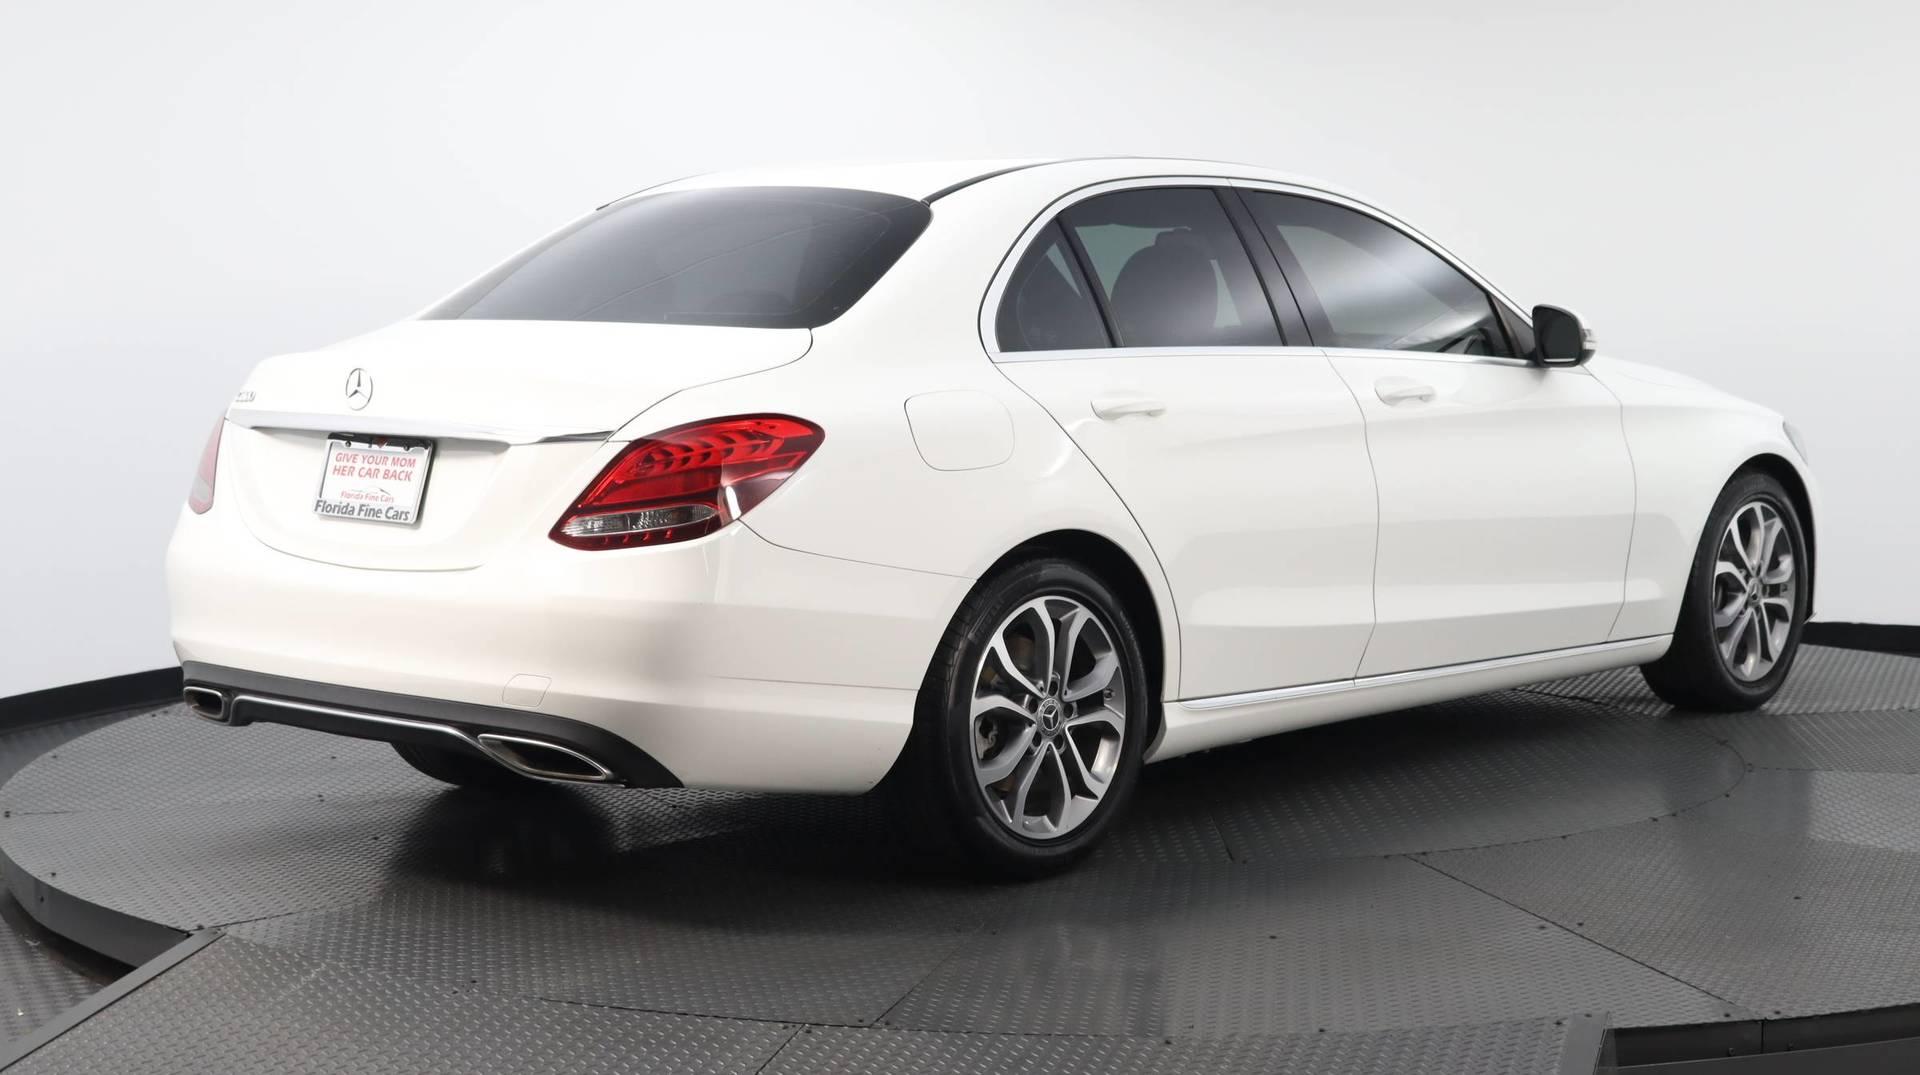 Florida Fine Cars - Used vehicle - Sedan MERCEDES-BENZ C-CLASS 2018